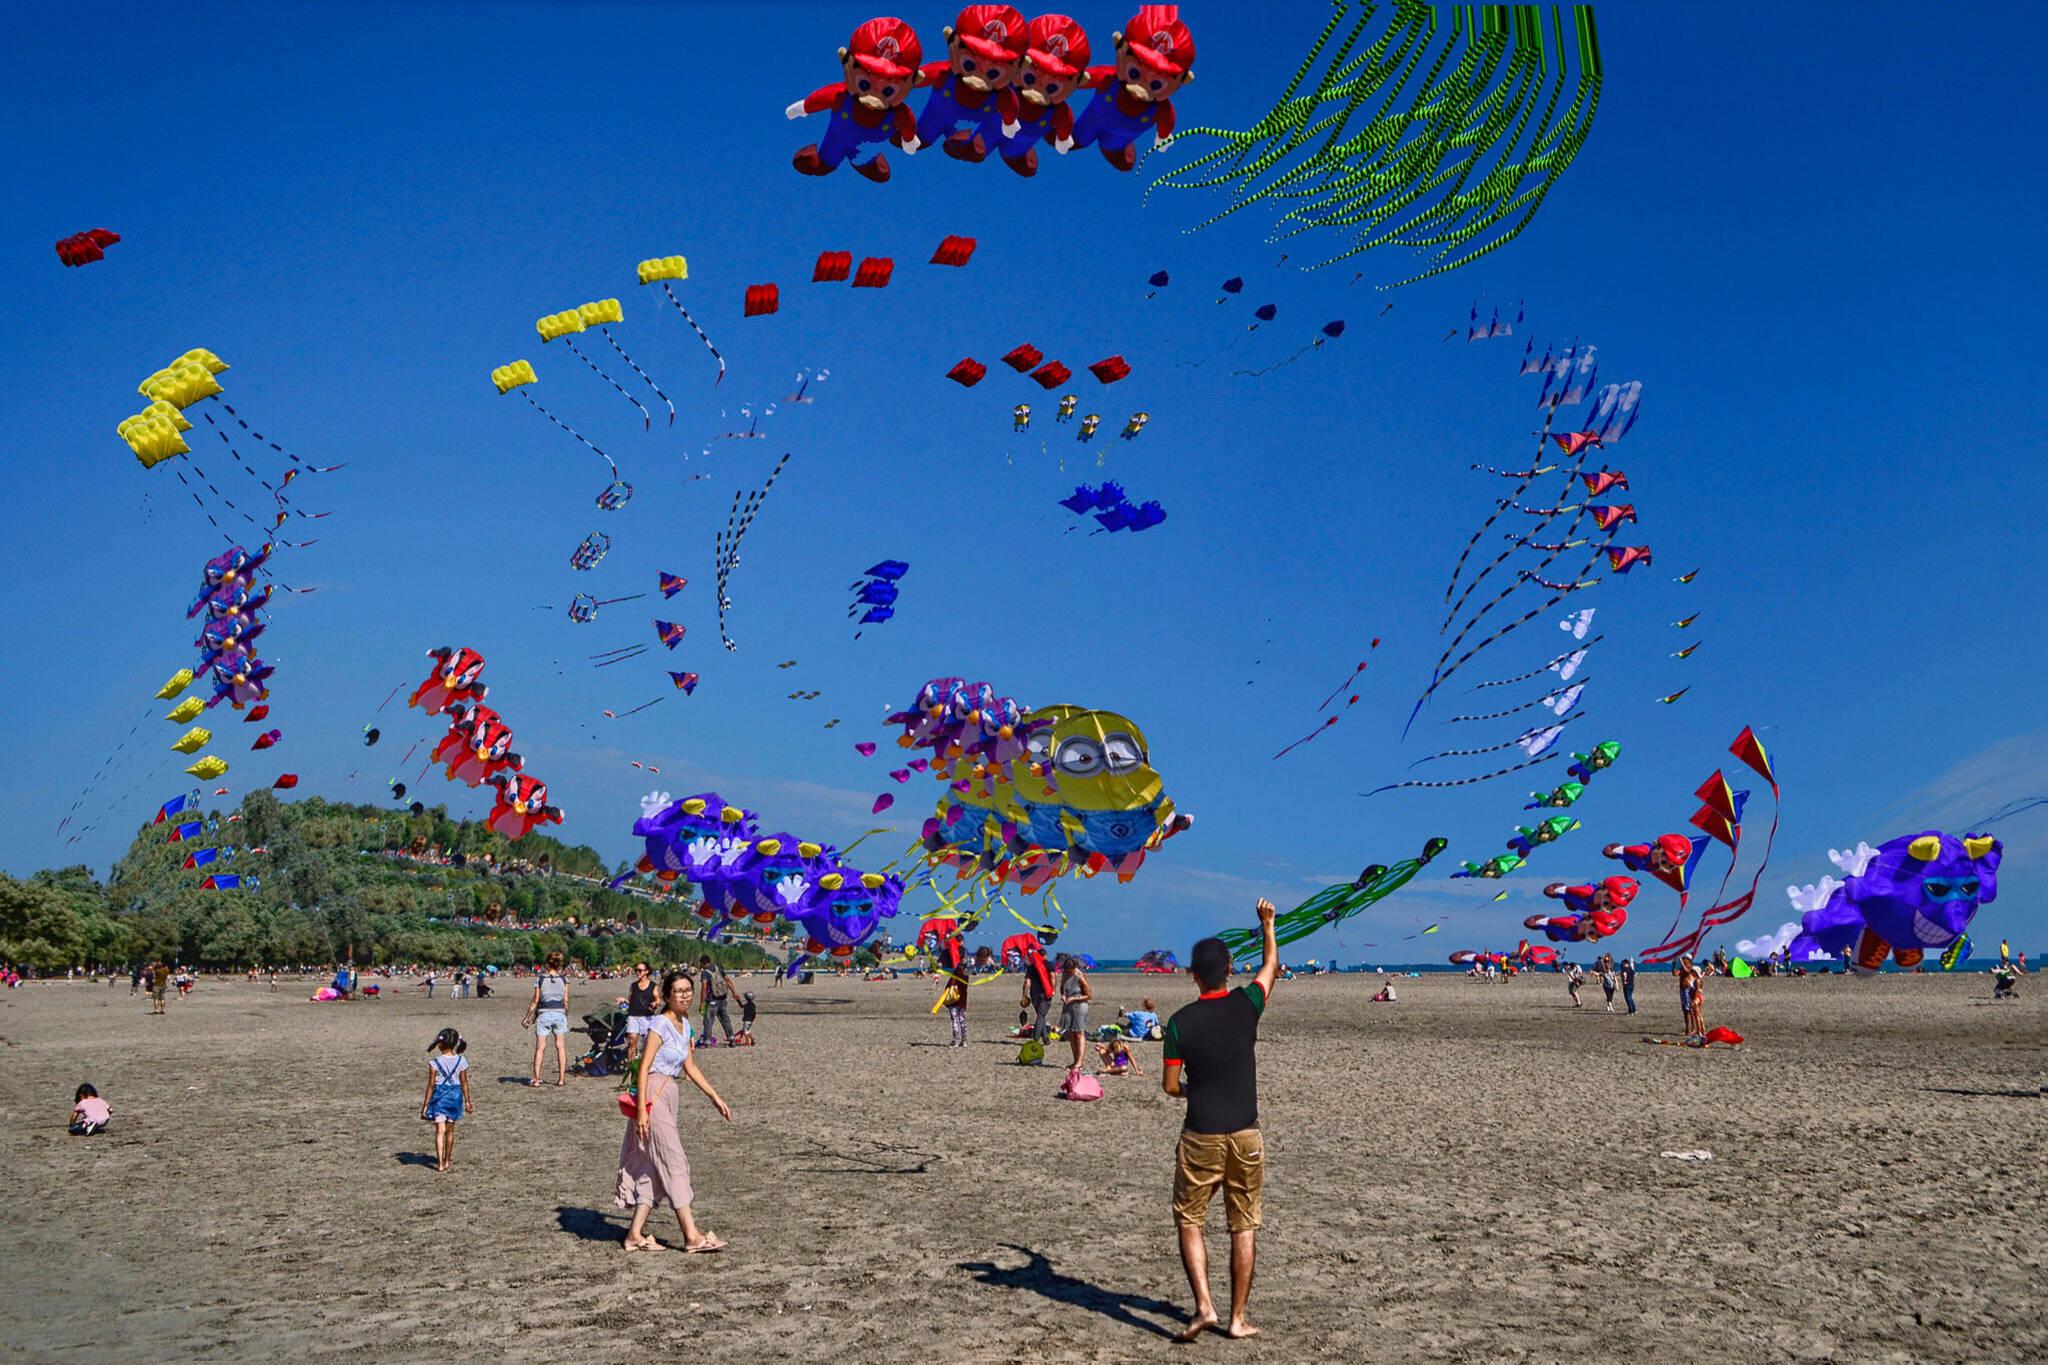 kite festival markdale